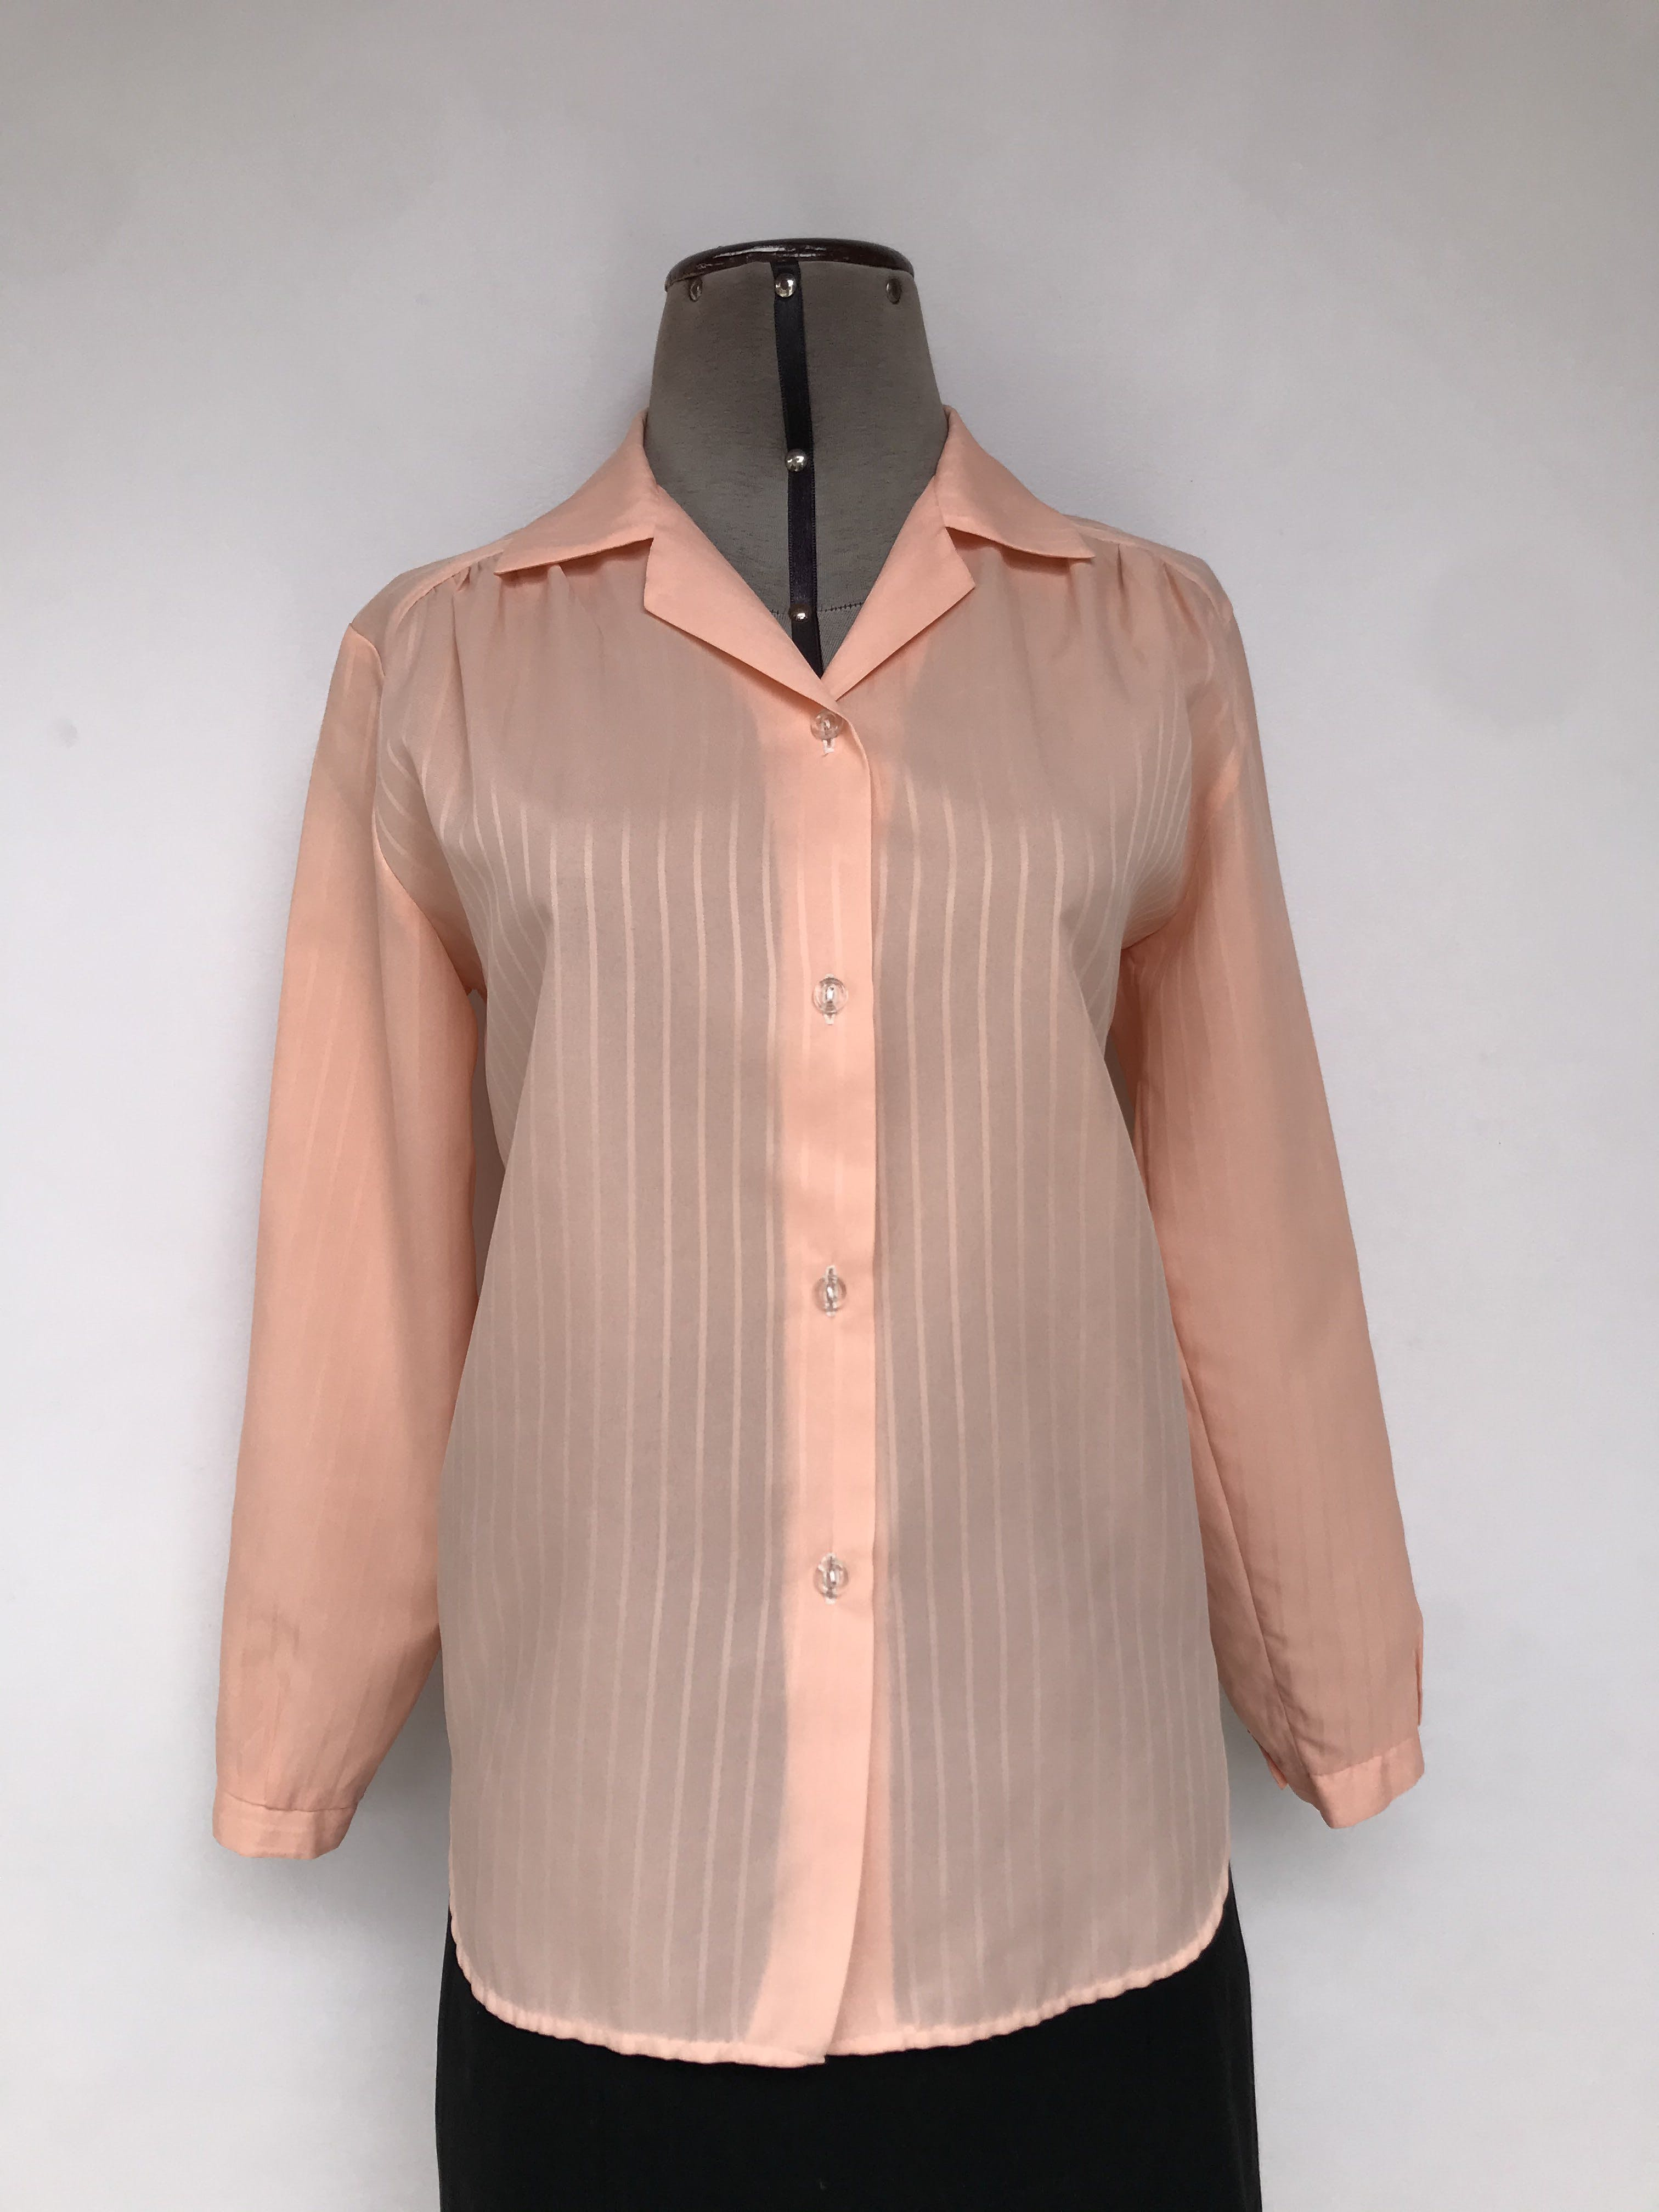 Blusa melón con líneas al tono ligeramente satinadas, fila de botones y manga larga Talla M